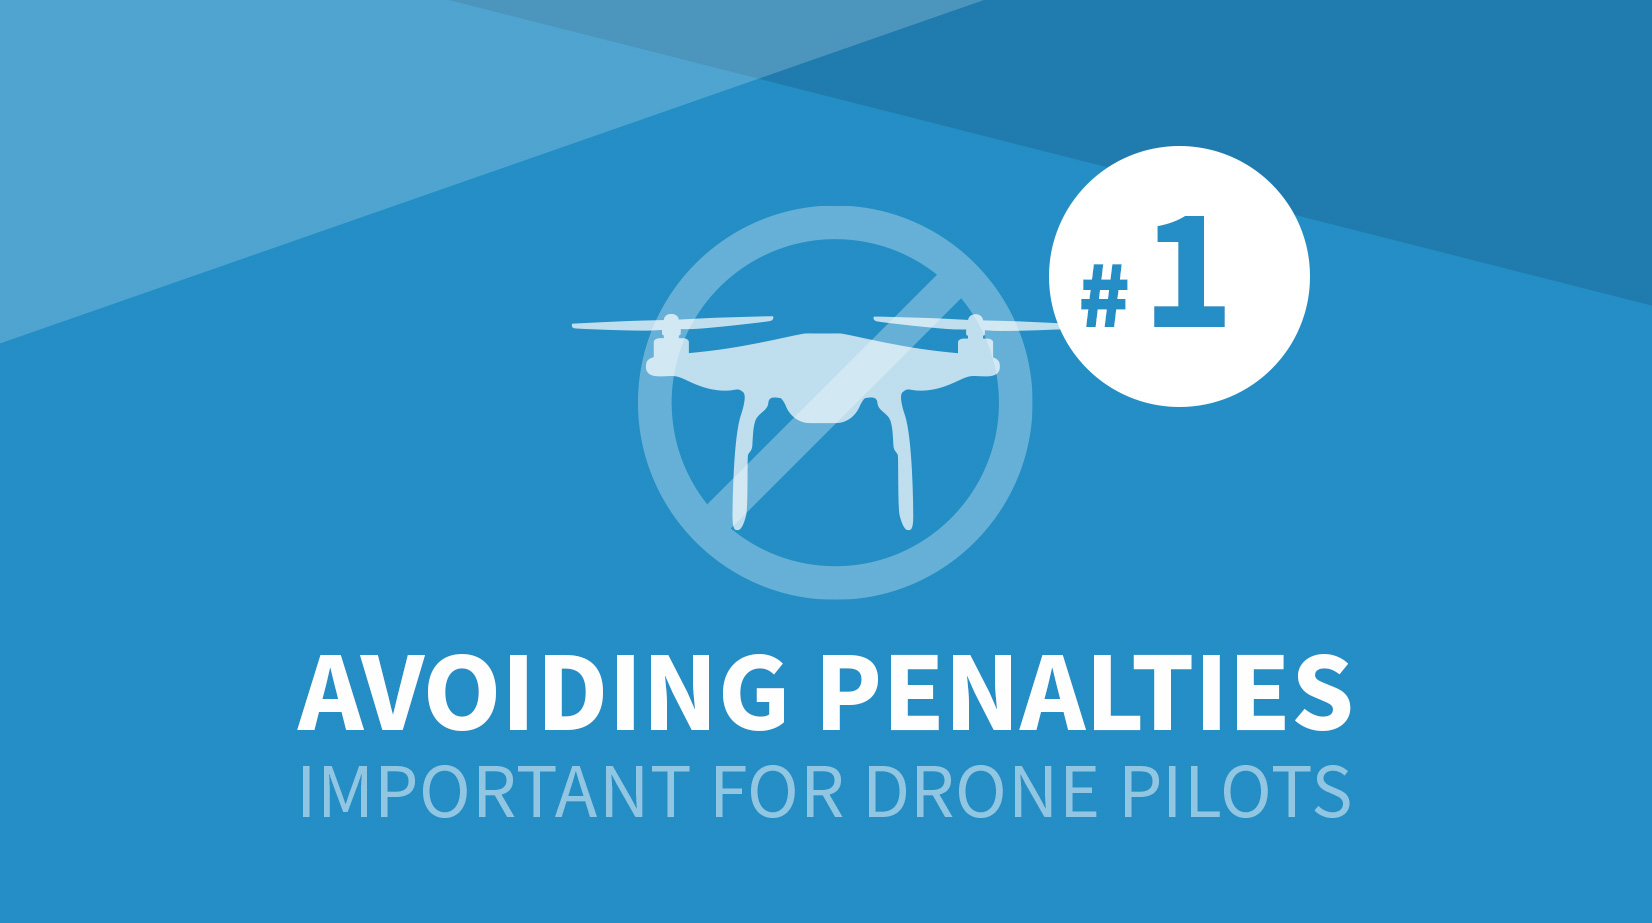 Avoiding Penalties for Drone Pilots